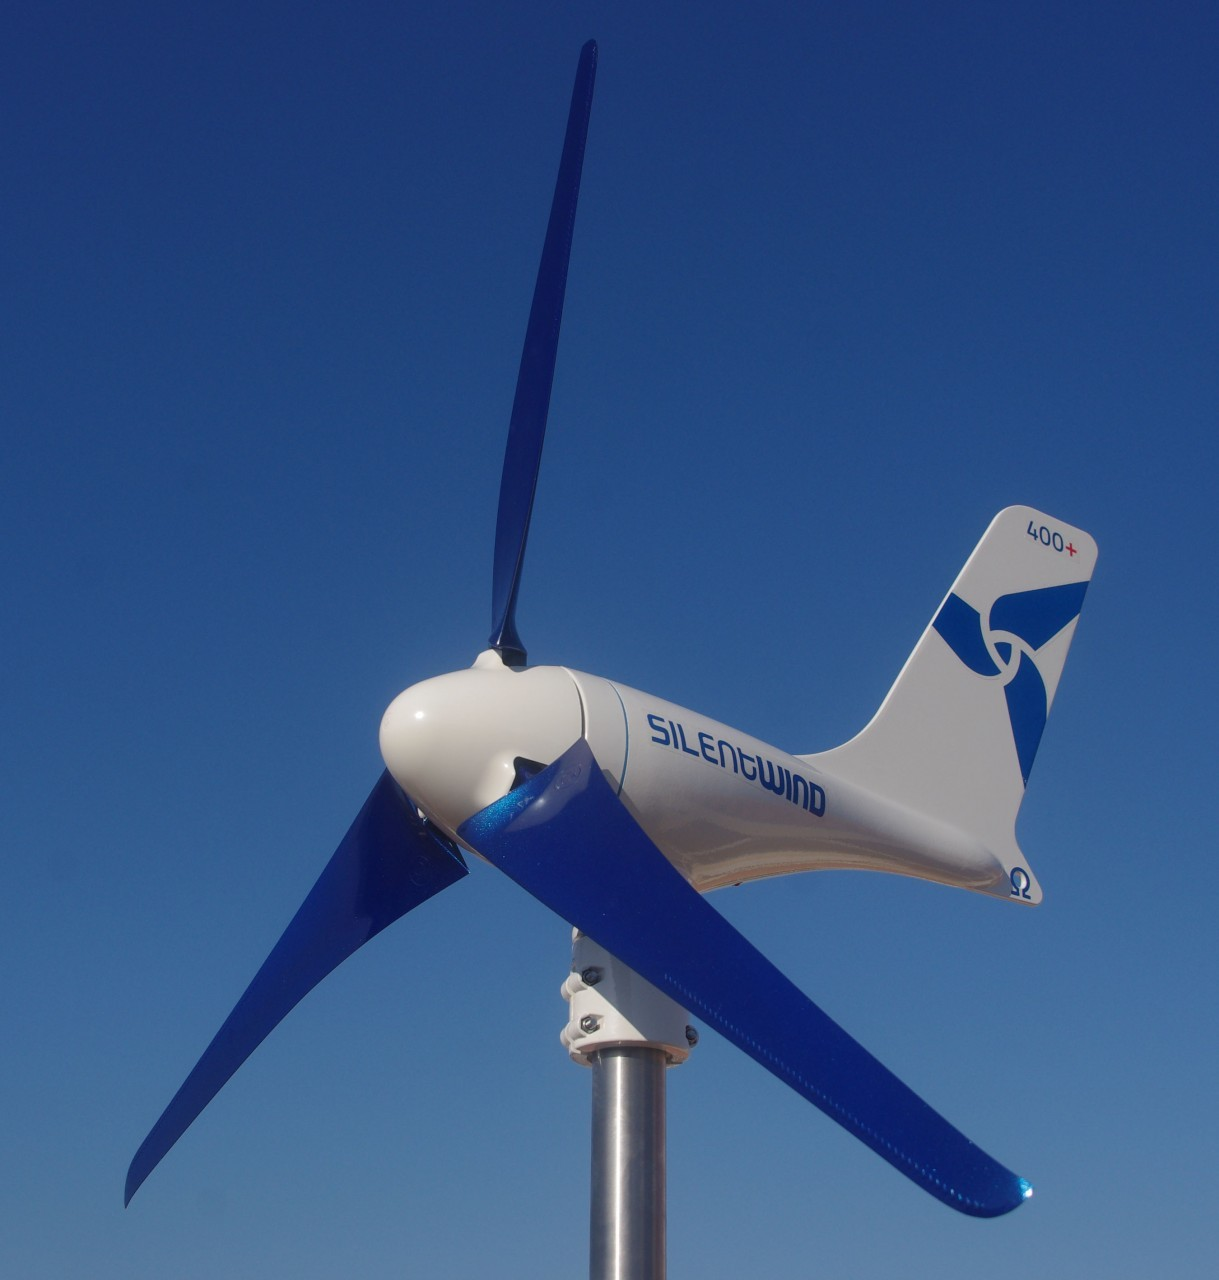 marine wind generator wiring diagram singer sewing machine threading silentwind 24v